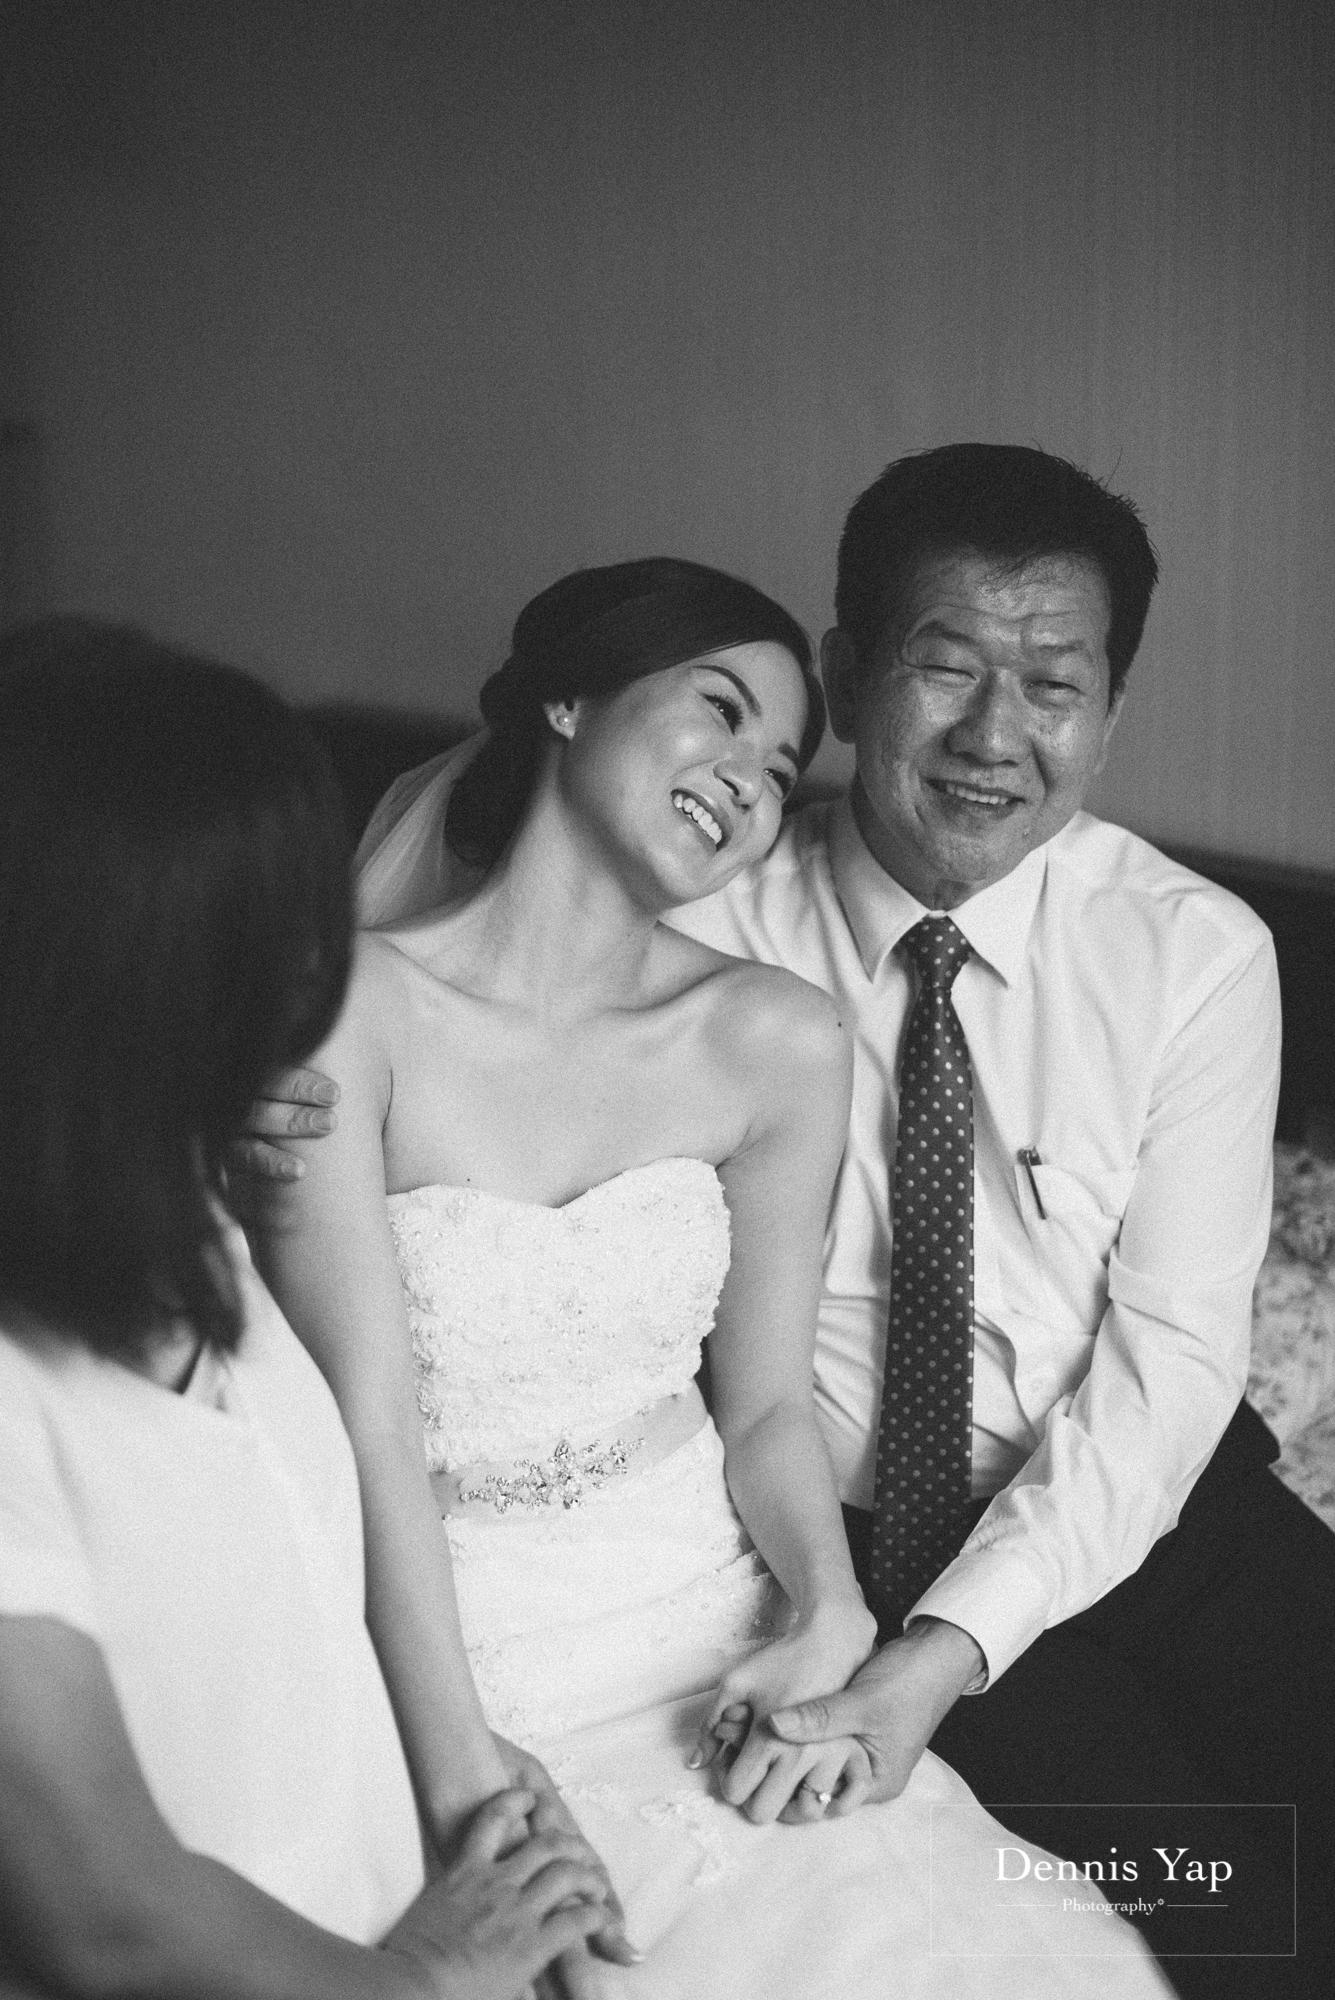 chin foo sze yin wedding day botanic klang club house dennis yap photography-6.jpg